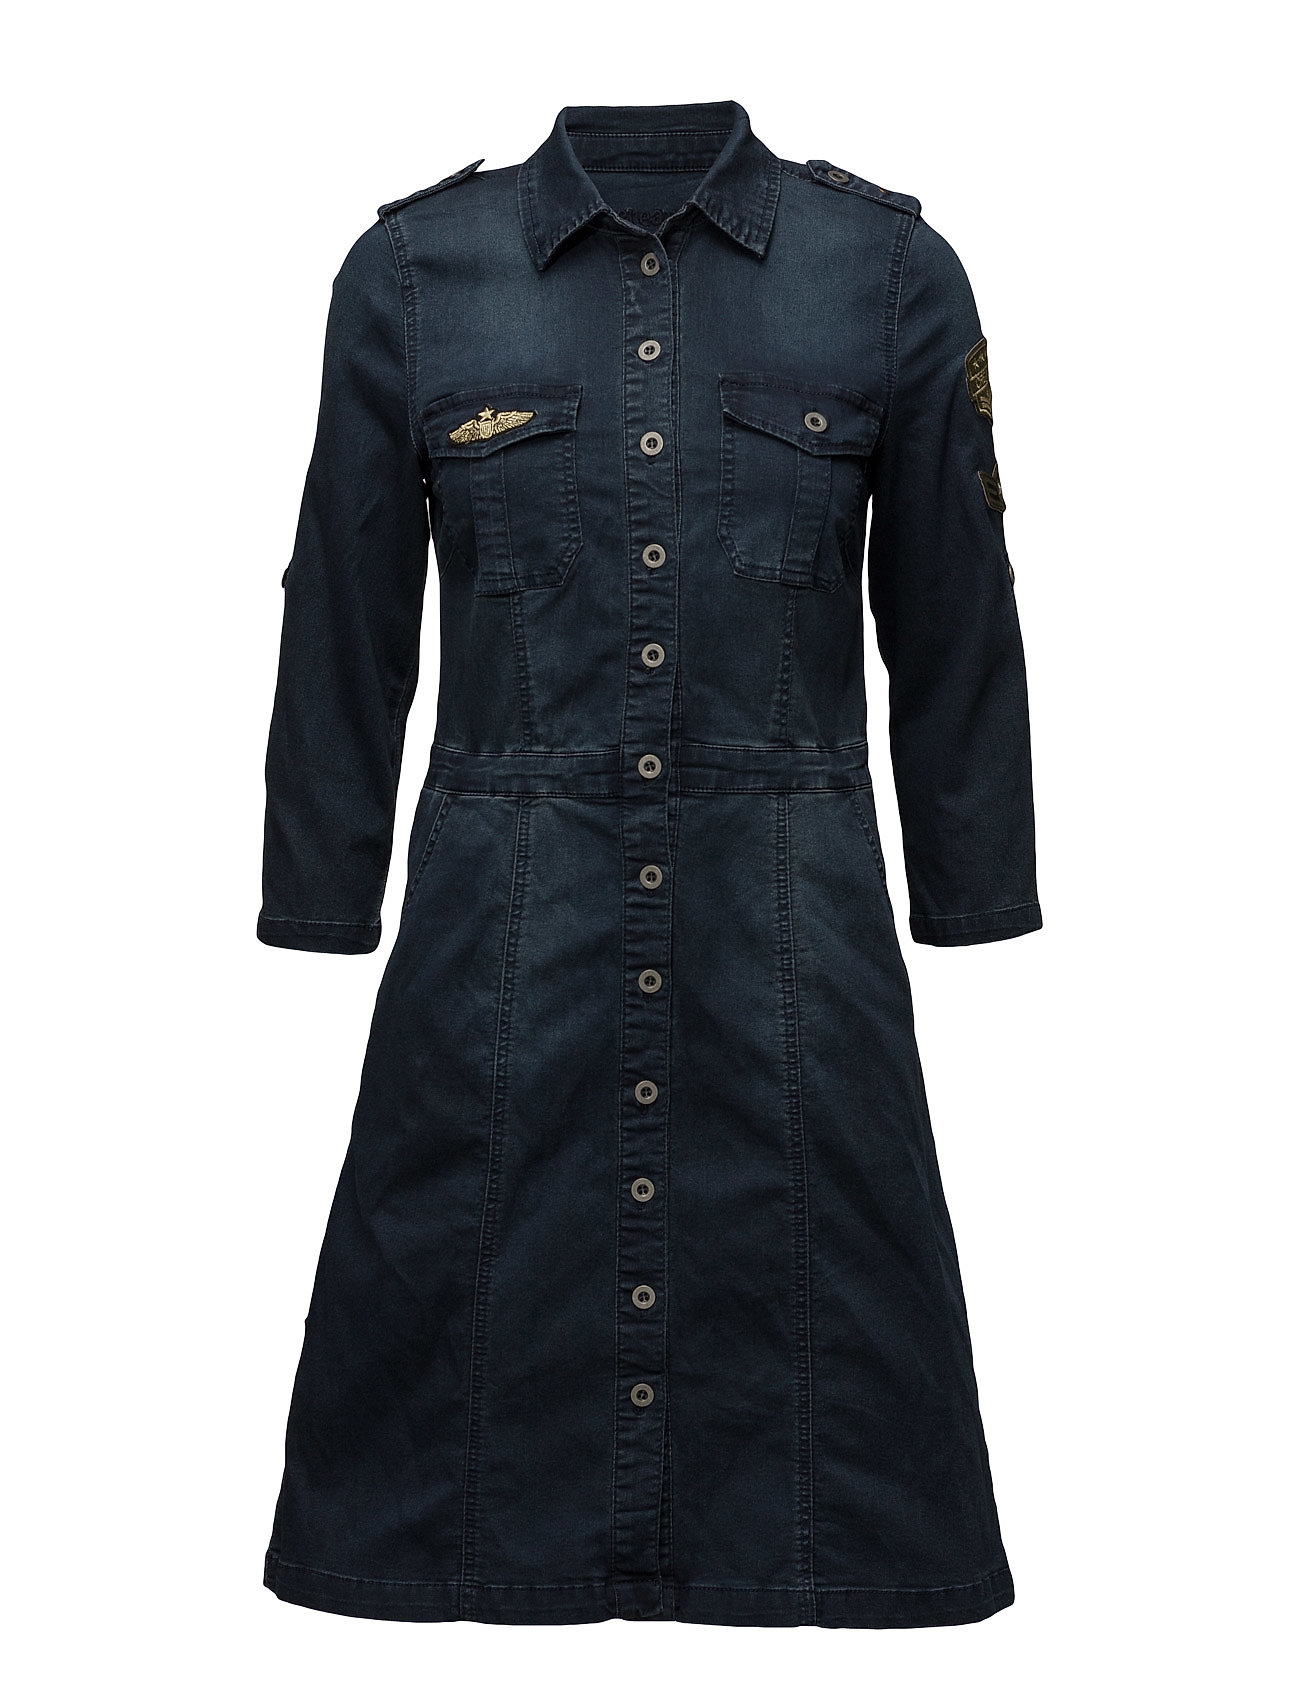 Uniform Denim Dress Cream Dresses thumbnail